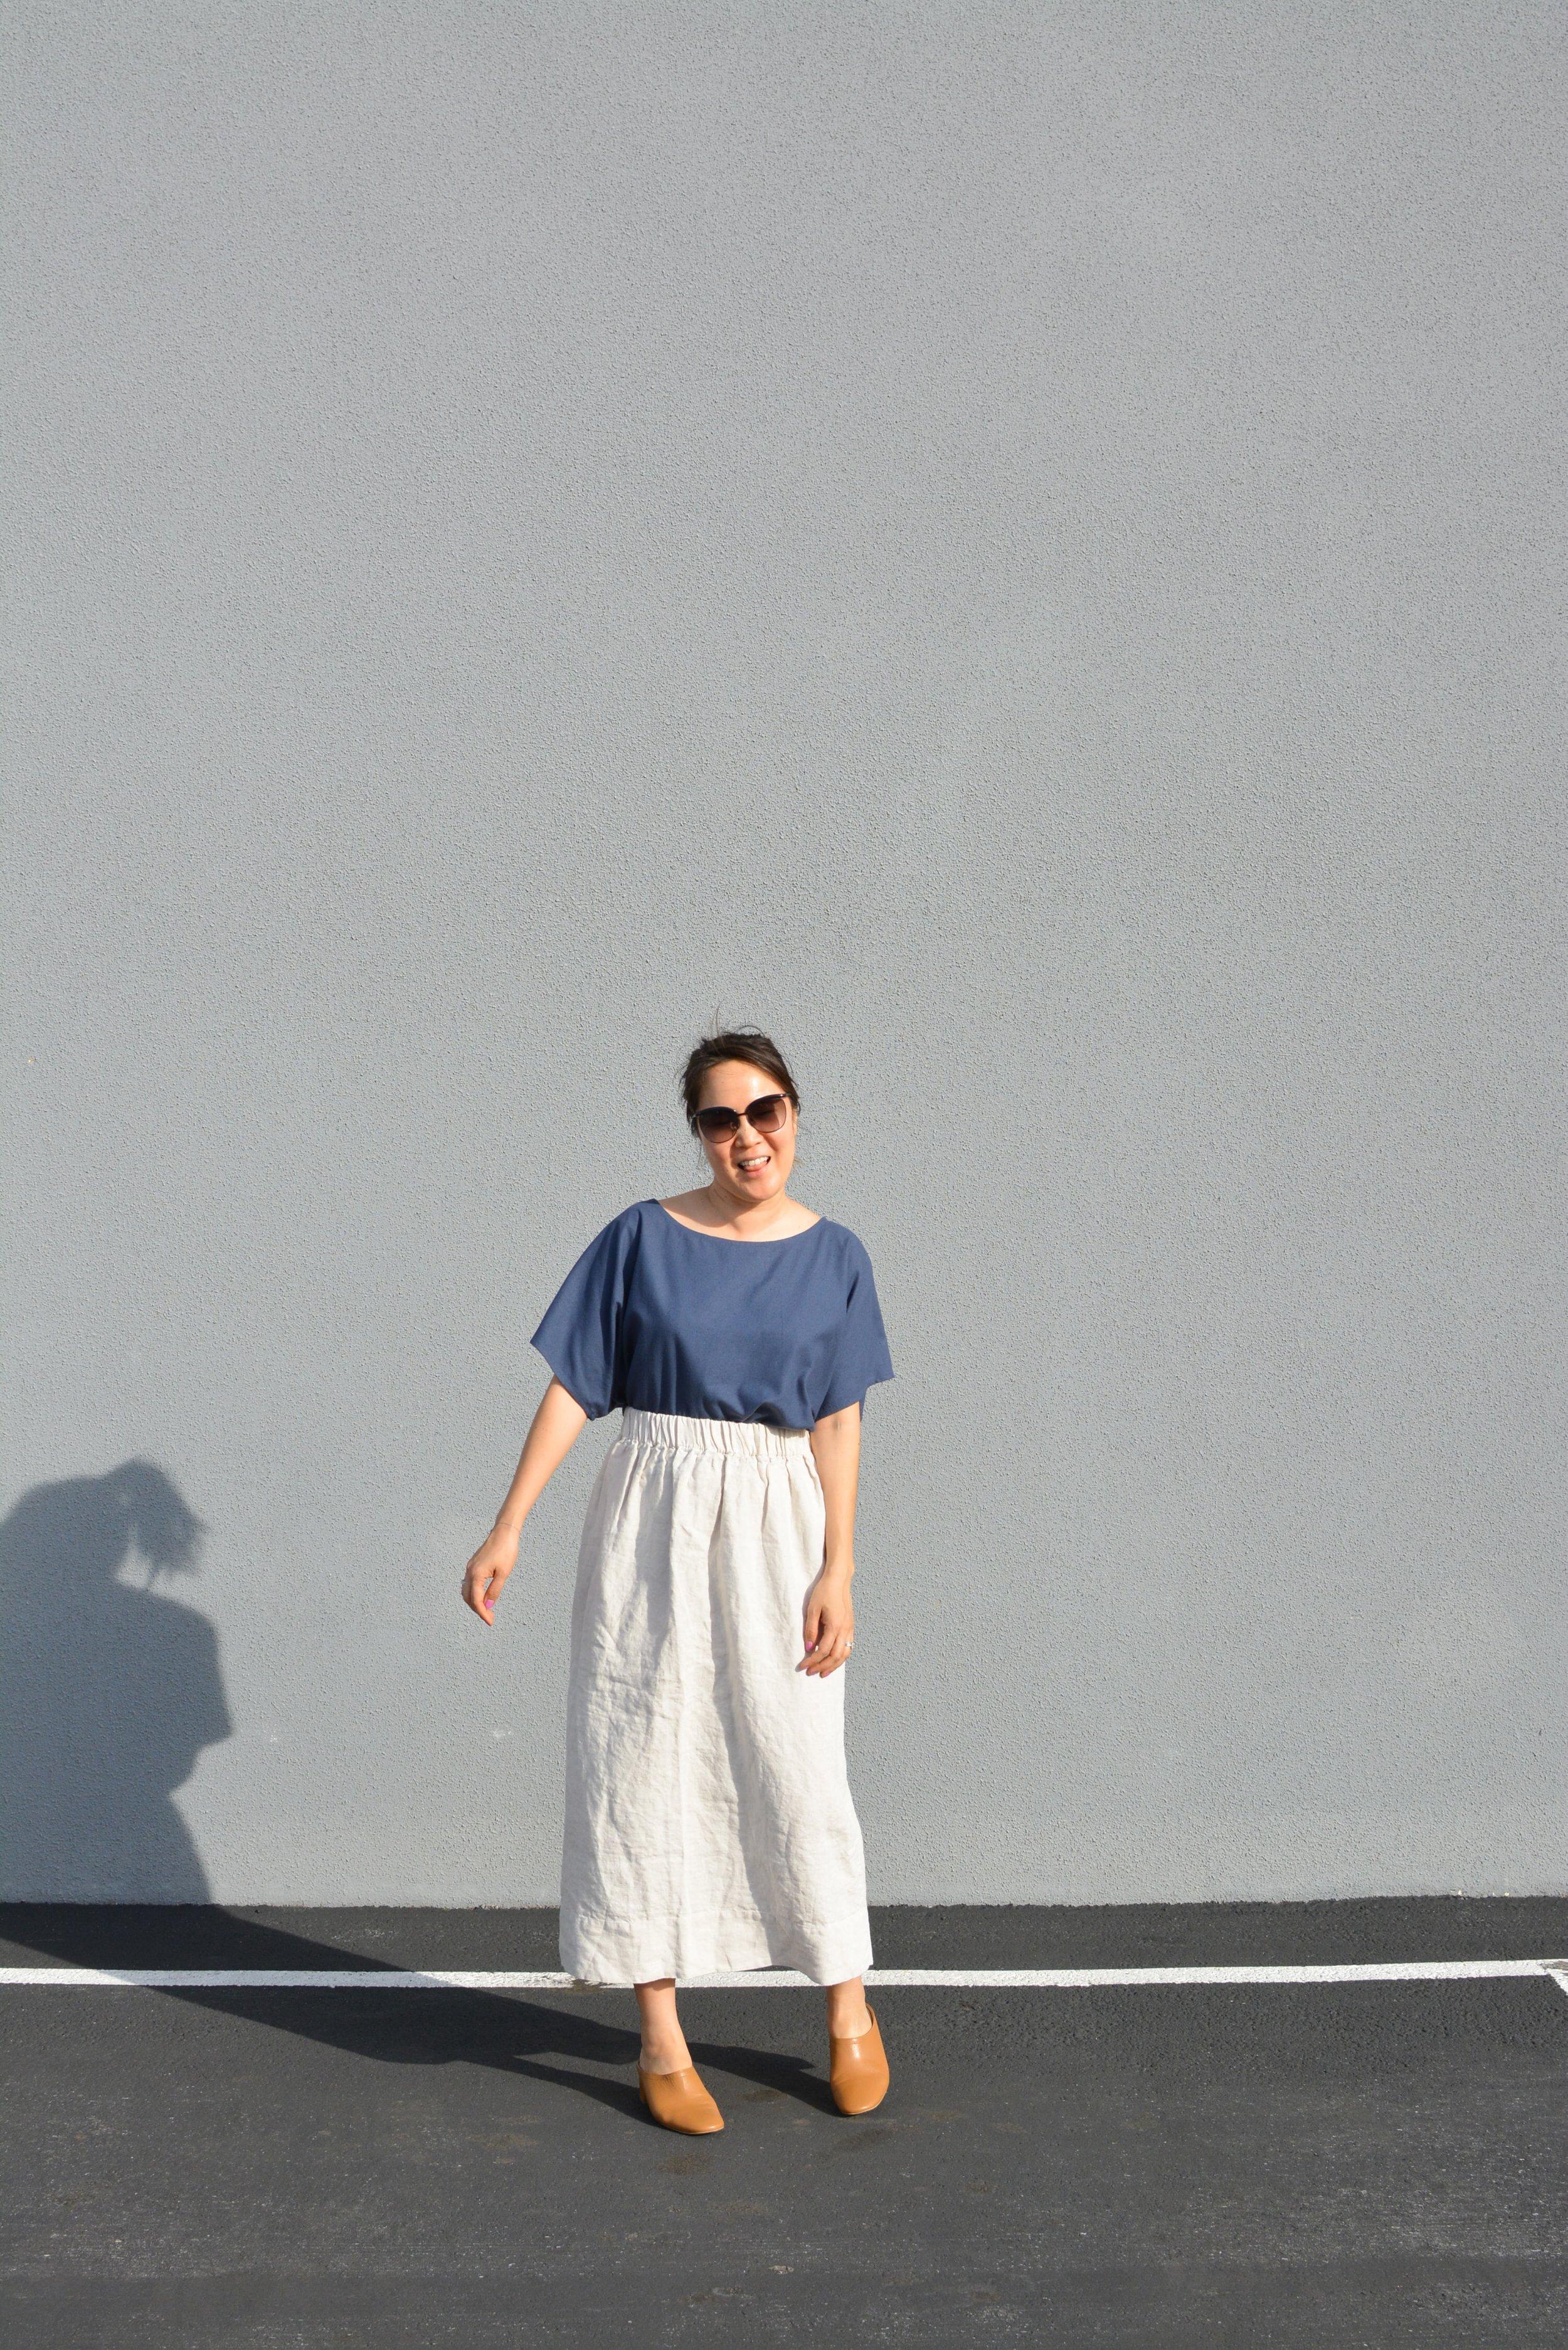 Elizabeth Suzann Review Linen Bel Skirt (5 of 6)-min.jpg